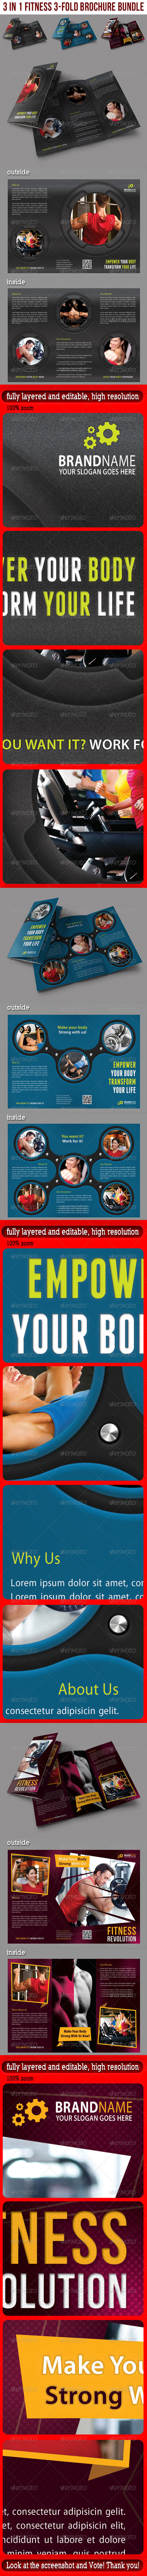 3 in 1 Fitness 3-Fold Brochure Bundle 02 - Informational Brochures